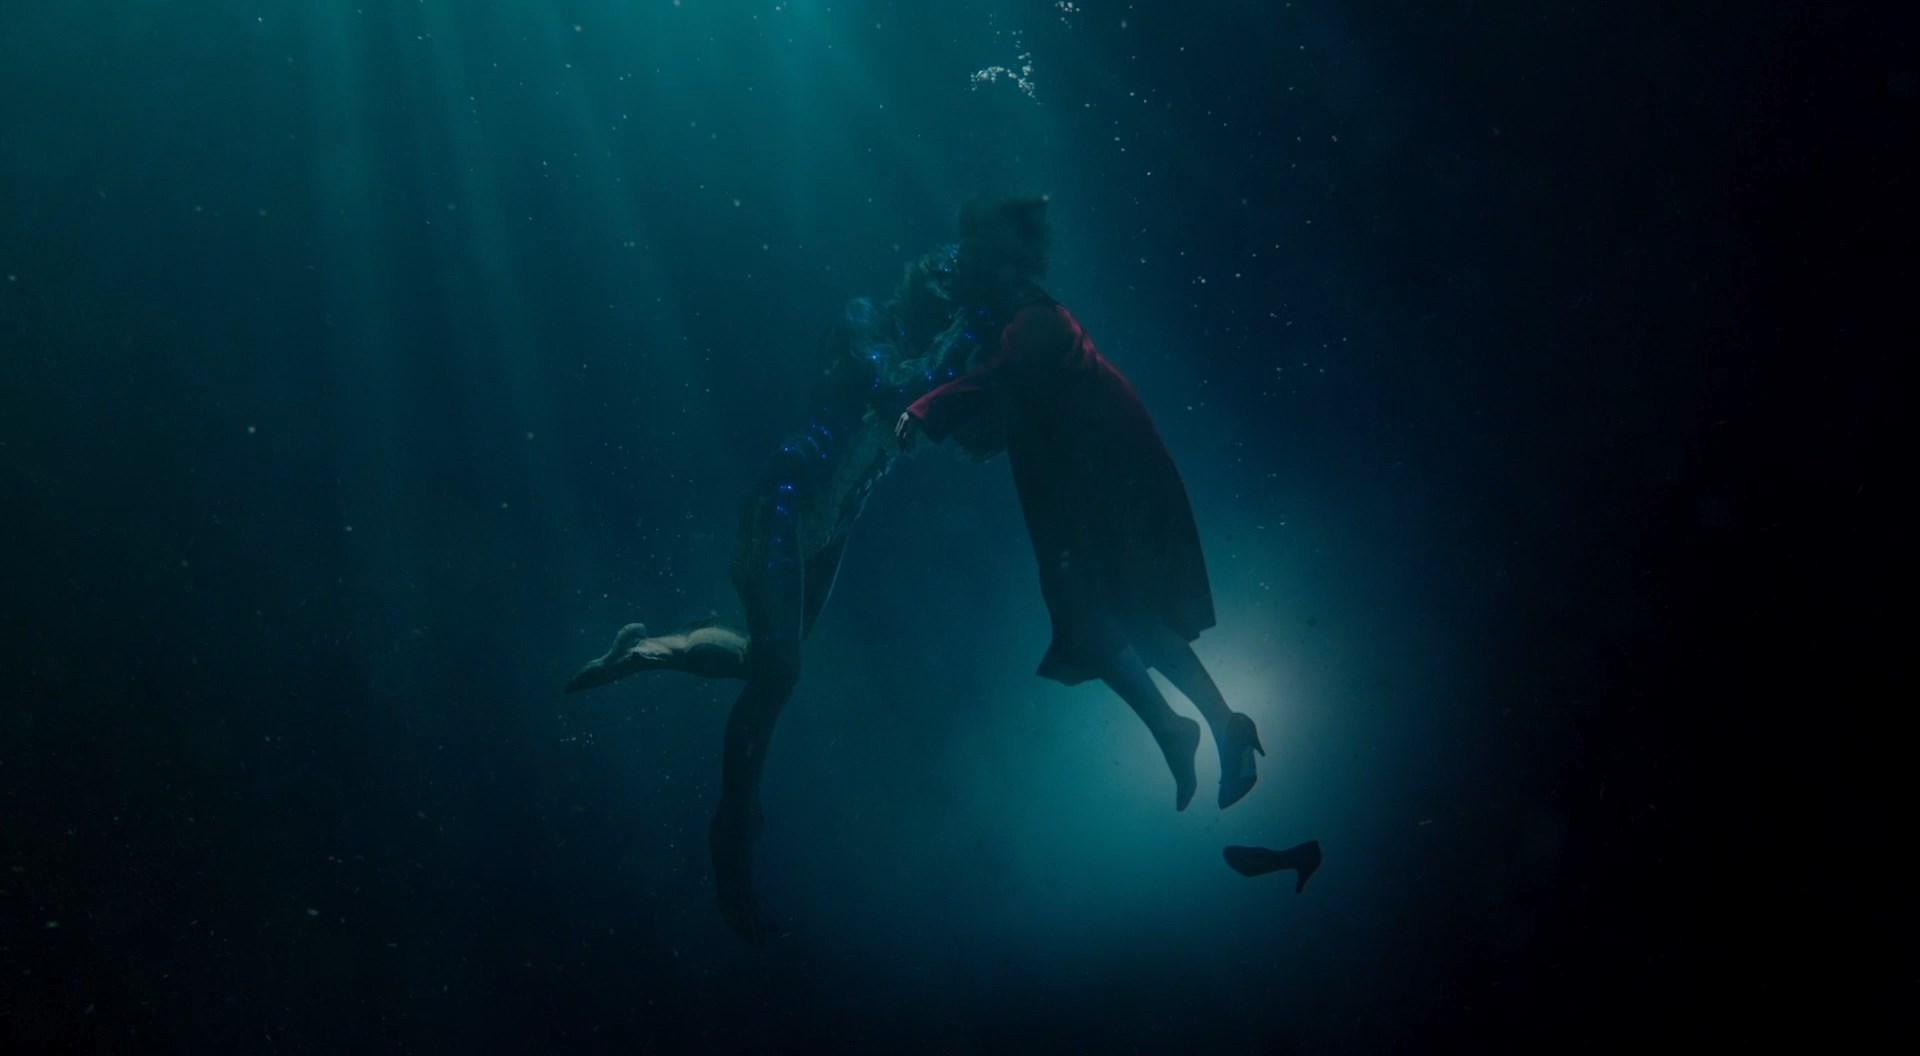 «Форма воды: Взрослая, трогательная и незабываемая сказка»